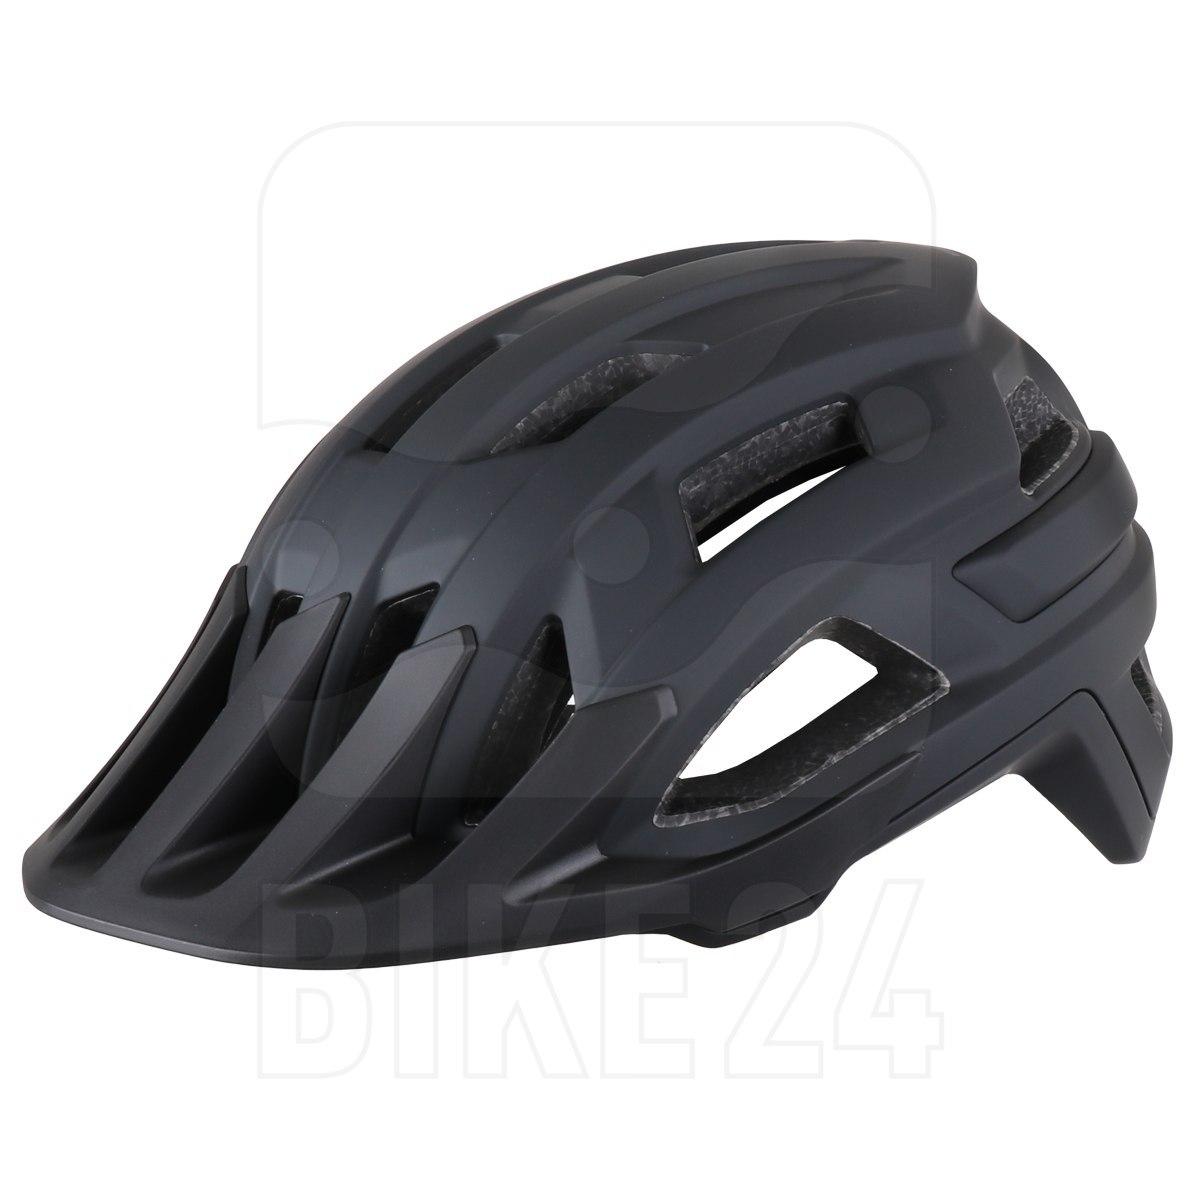 CUBE Helmet ROOK - black